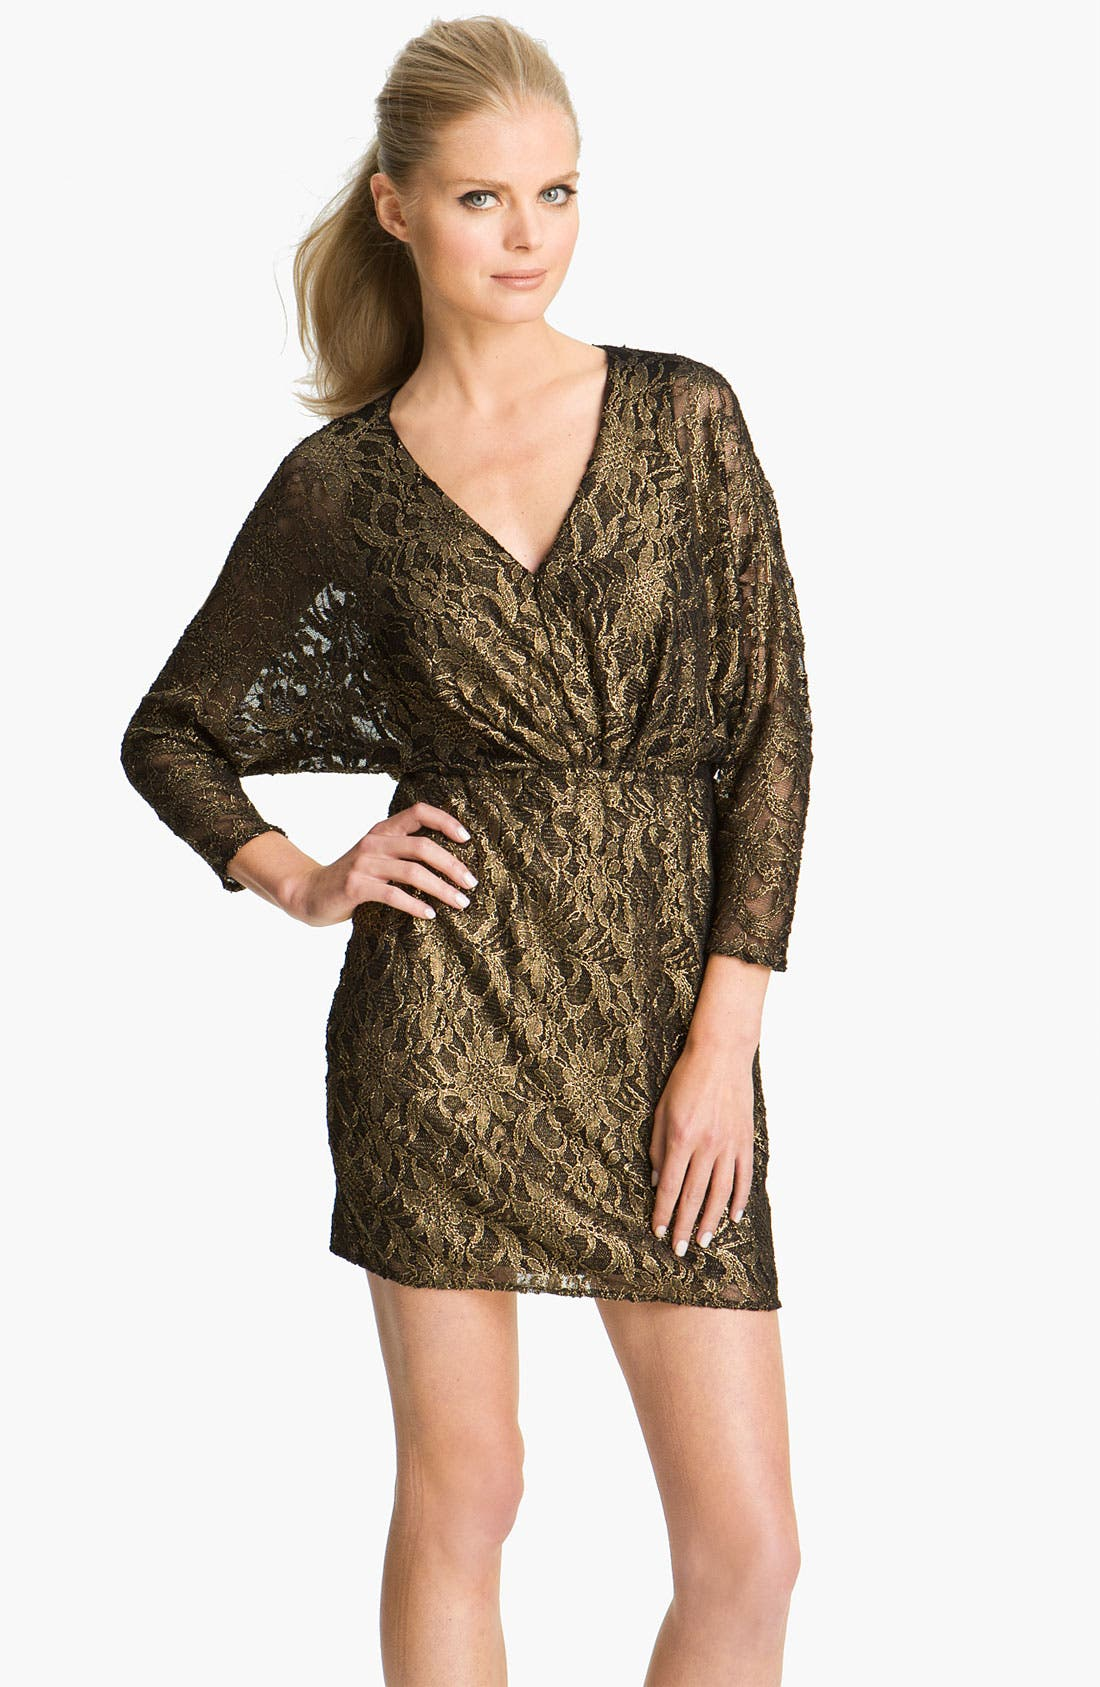 Main Image - Trina Turk 'Birch' Metallic Lace Blouson Dress